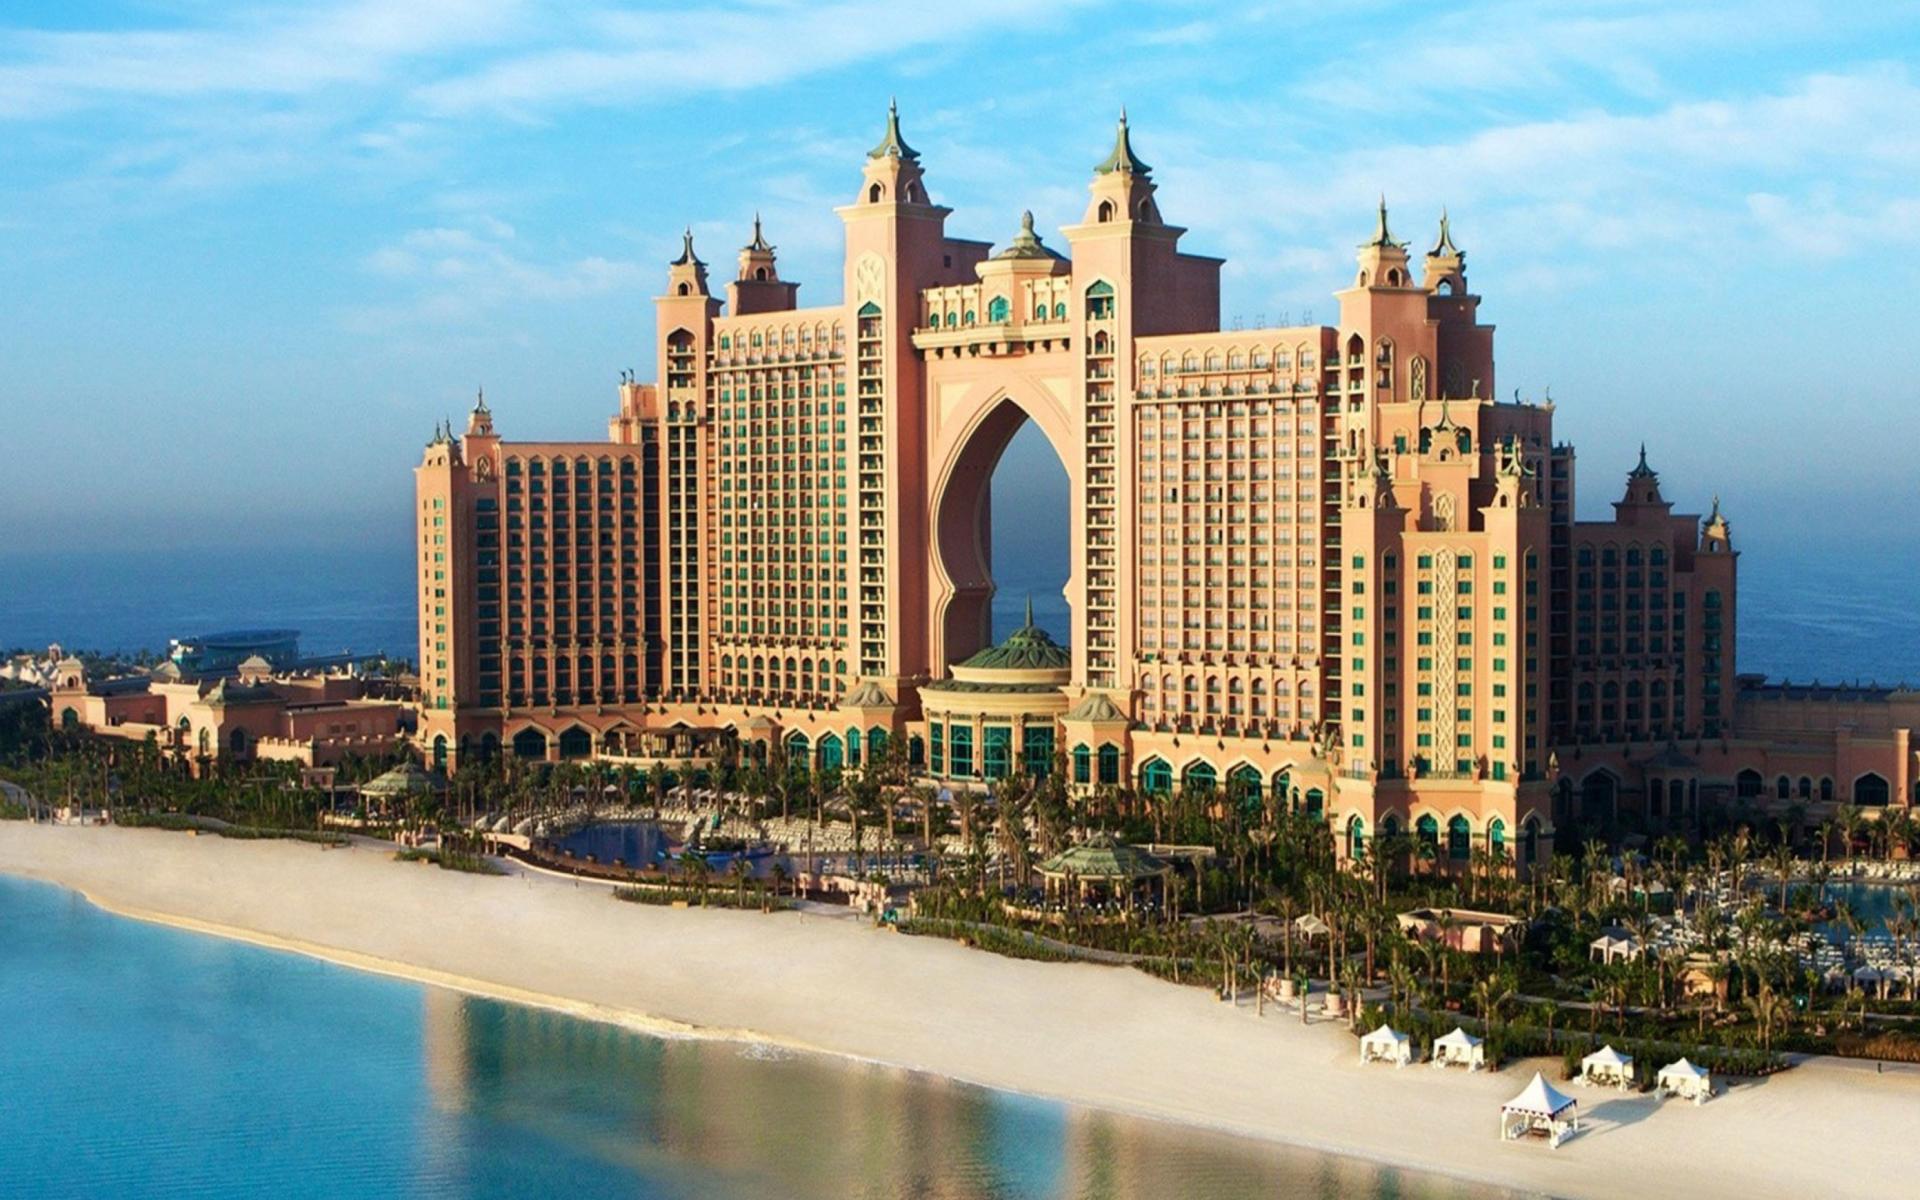 Hotel Atlantis UAE para Widescreen Desktop PC 1920x1080 Full HD